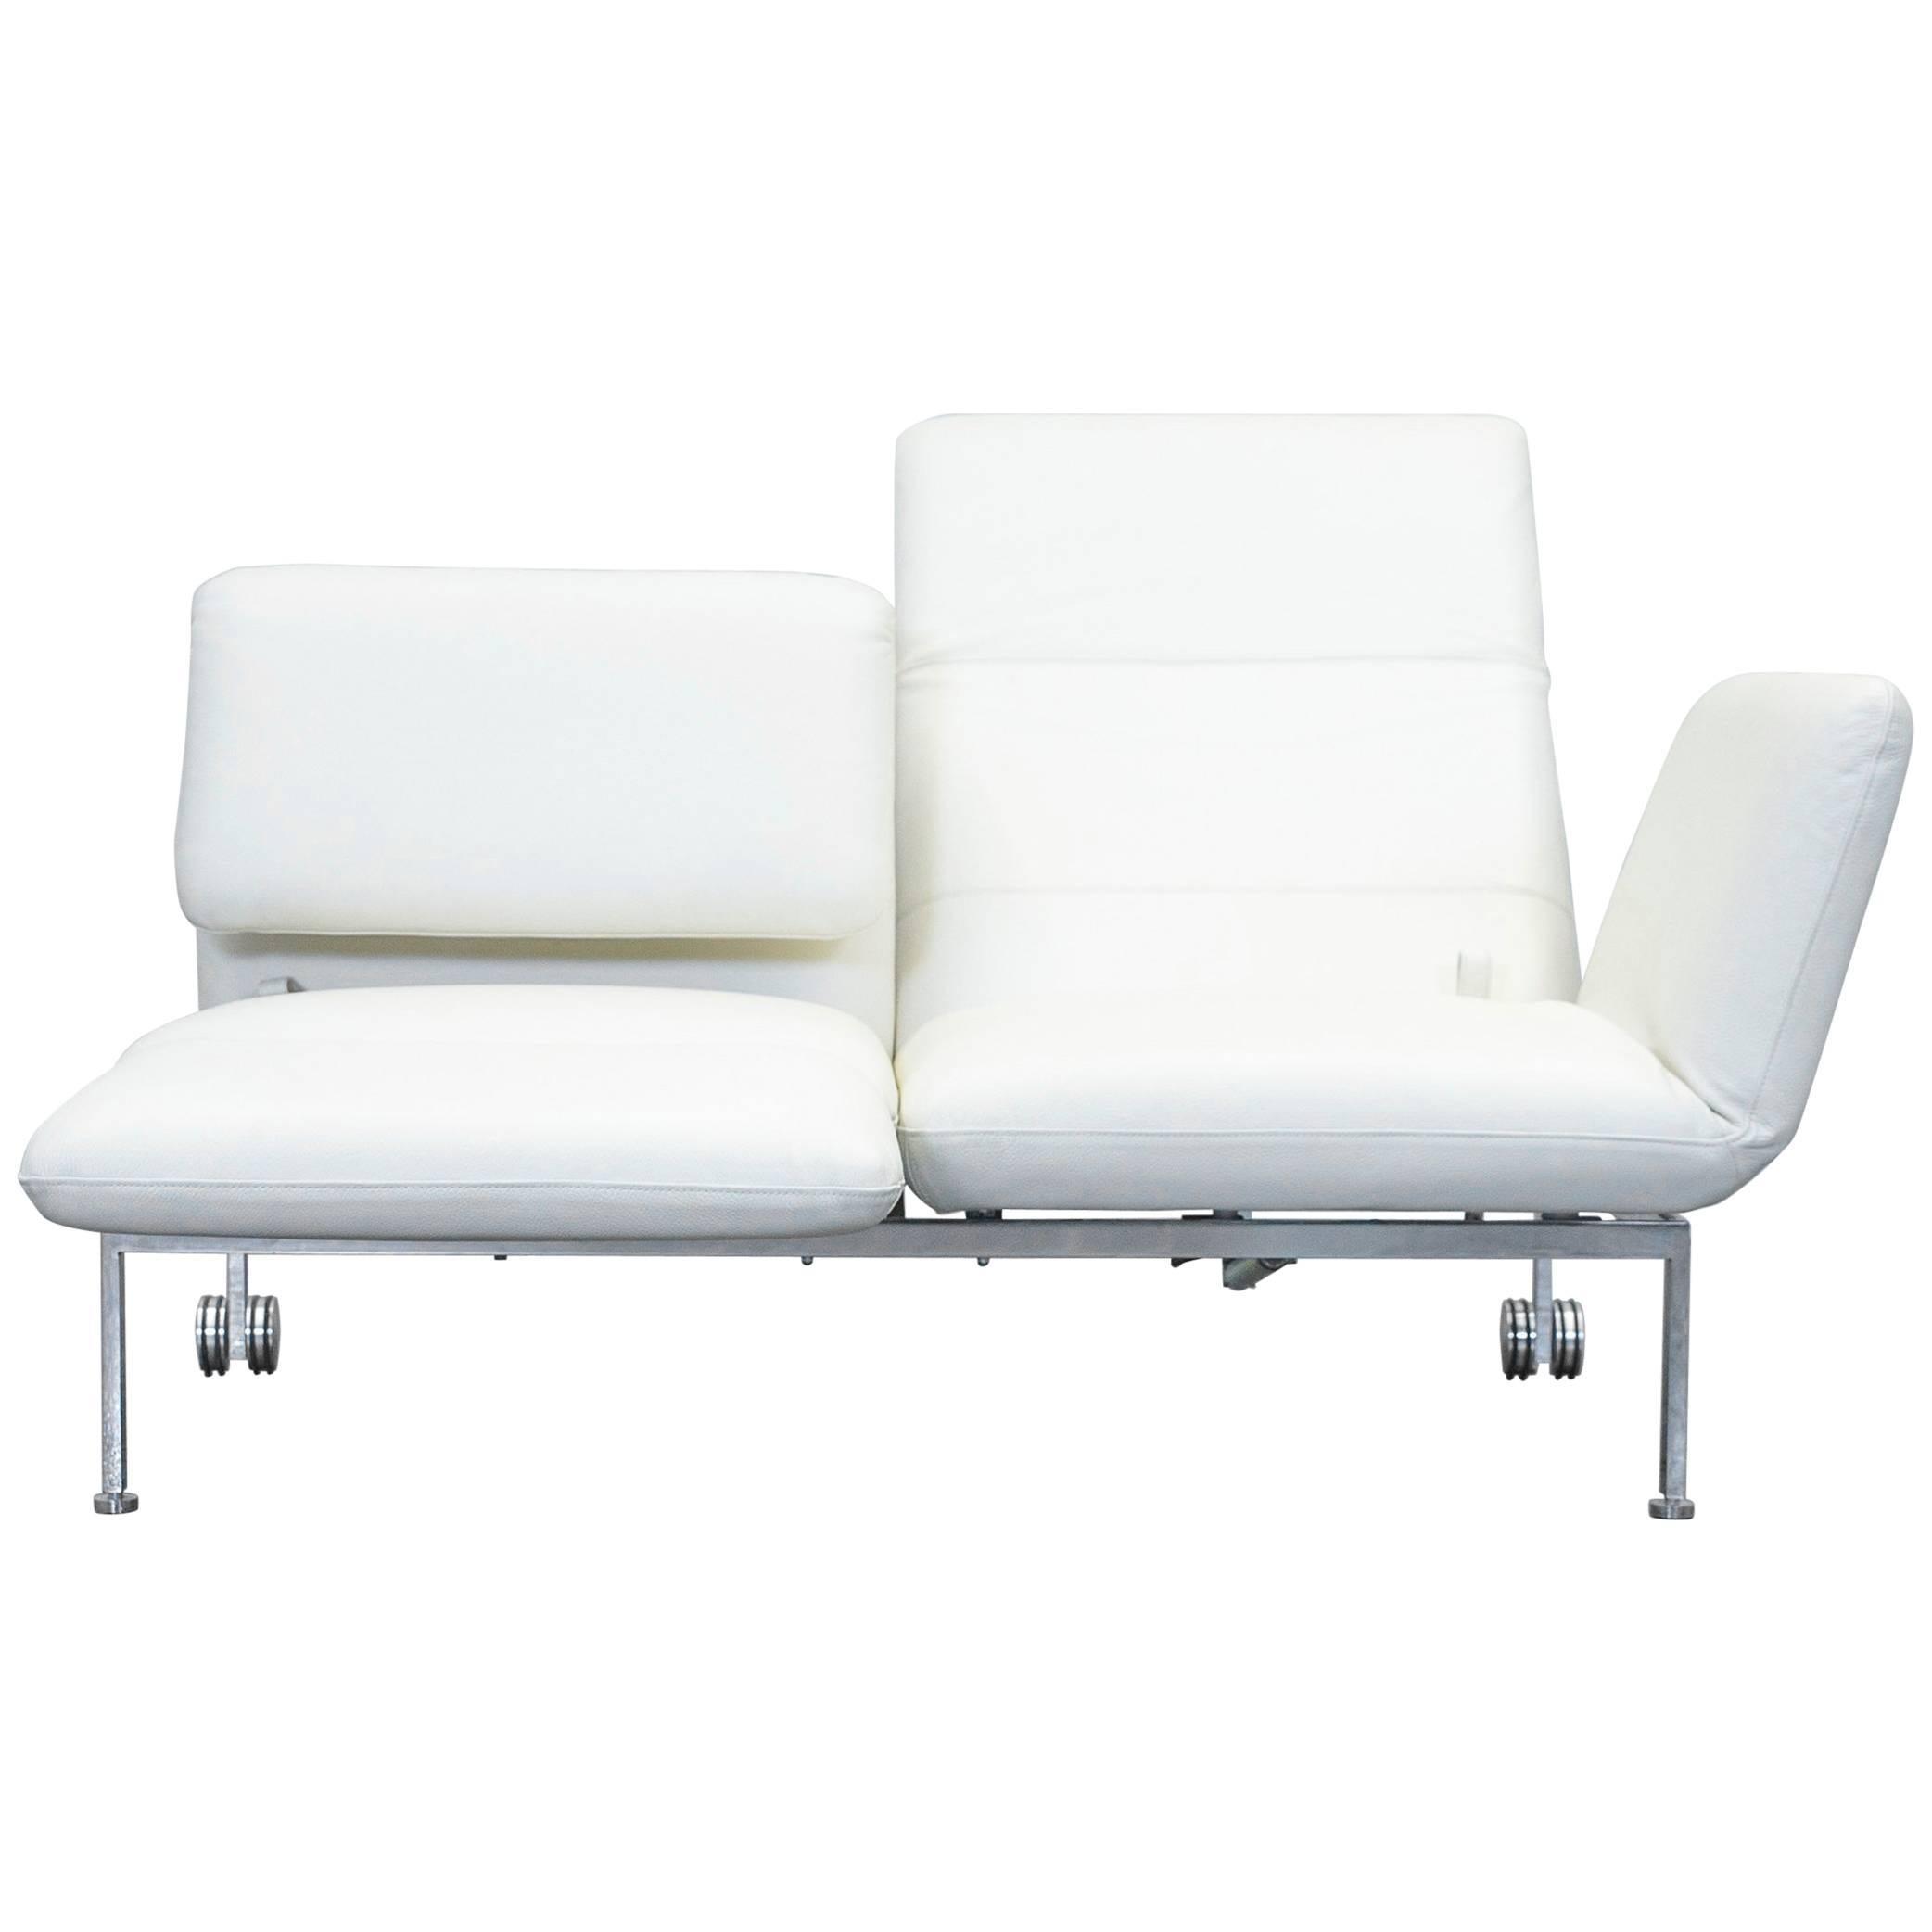 Bon Brühl U0026 Sippold Roro Small Designer Leather Sofa Crème Function Two Seat  Modern For Sale